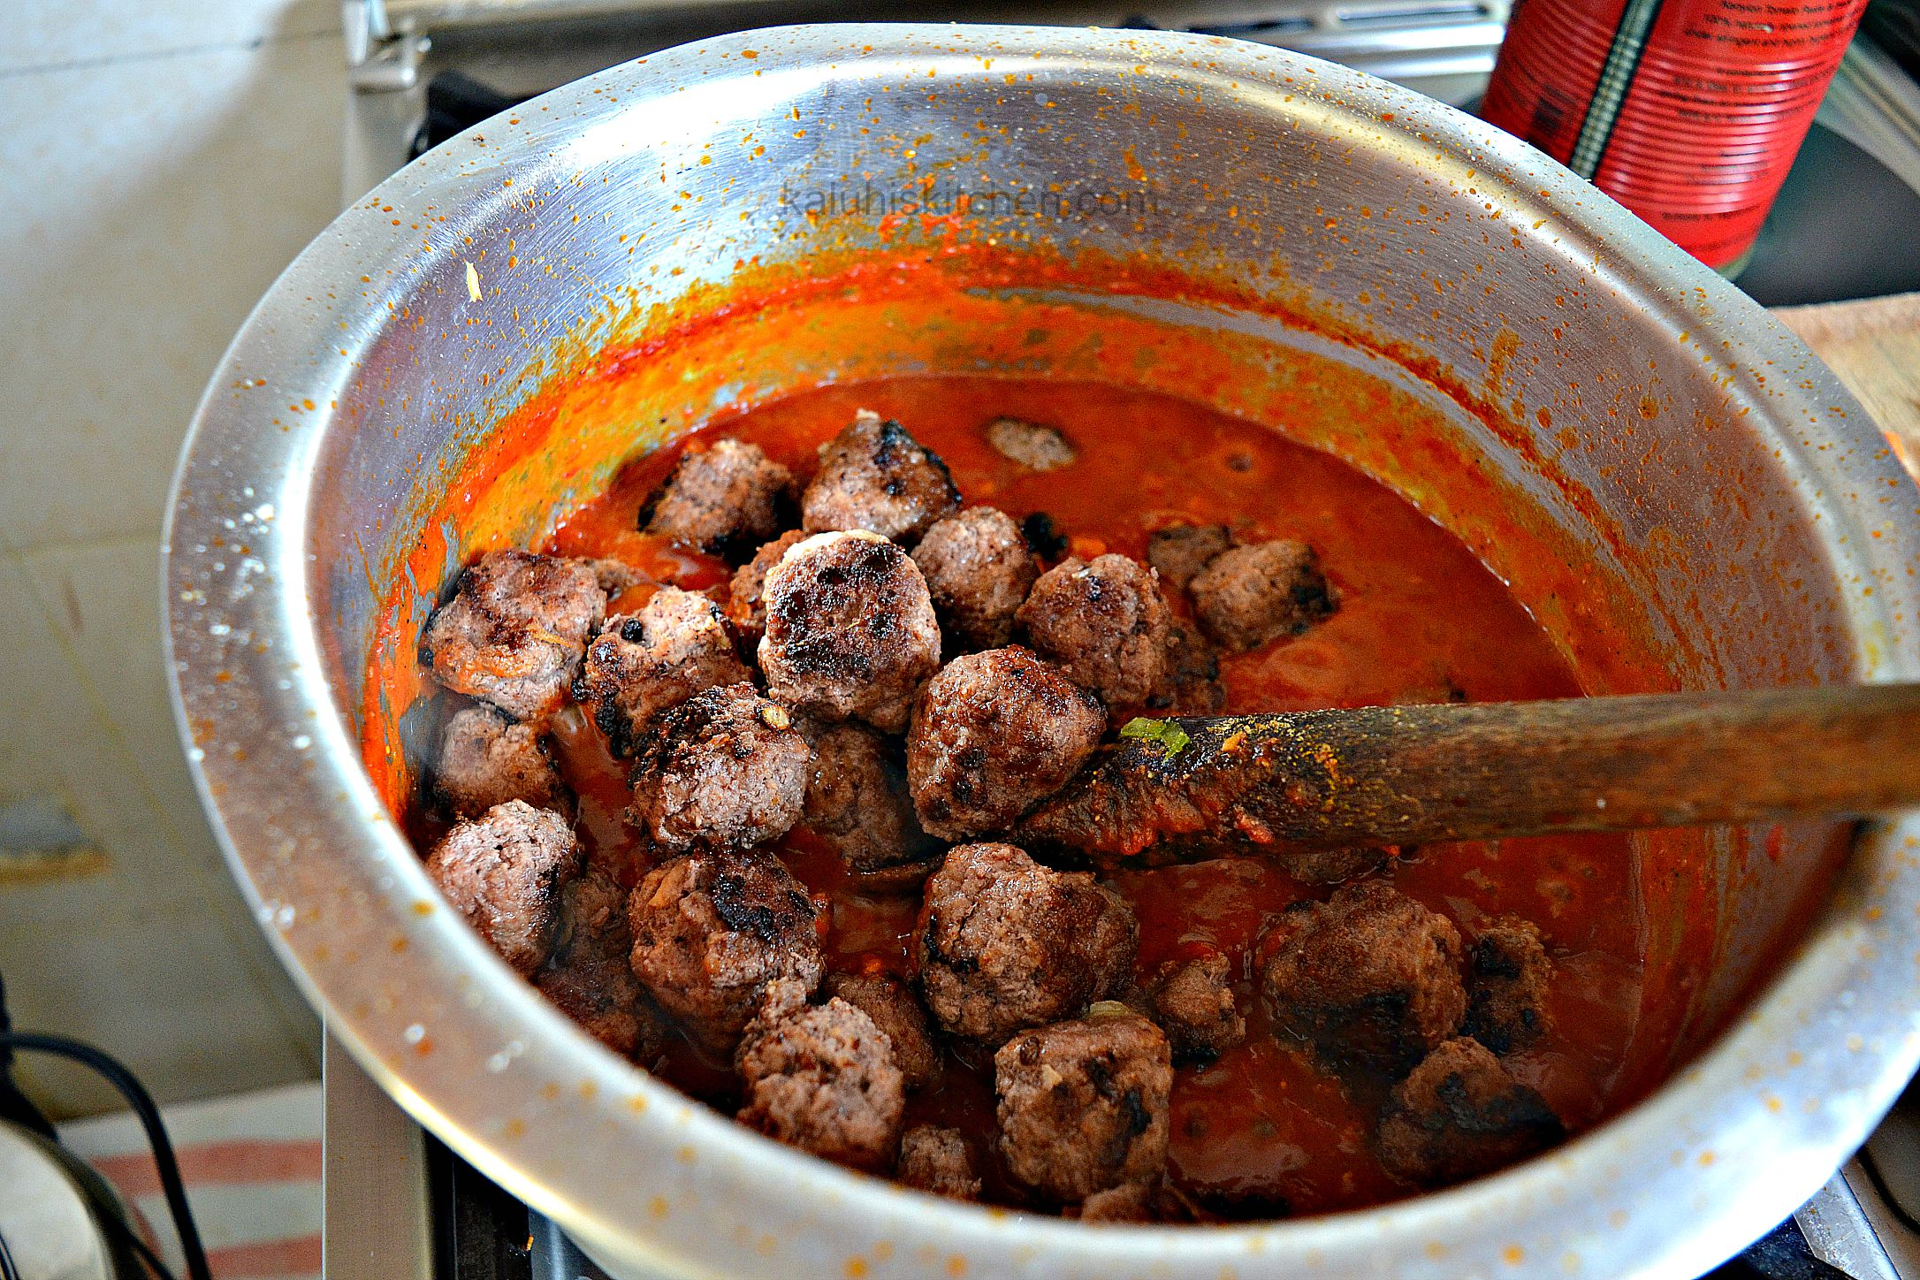 kenyan food_kenyan food bloggers_meatball tikka masala_kaluhiskitchen.com